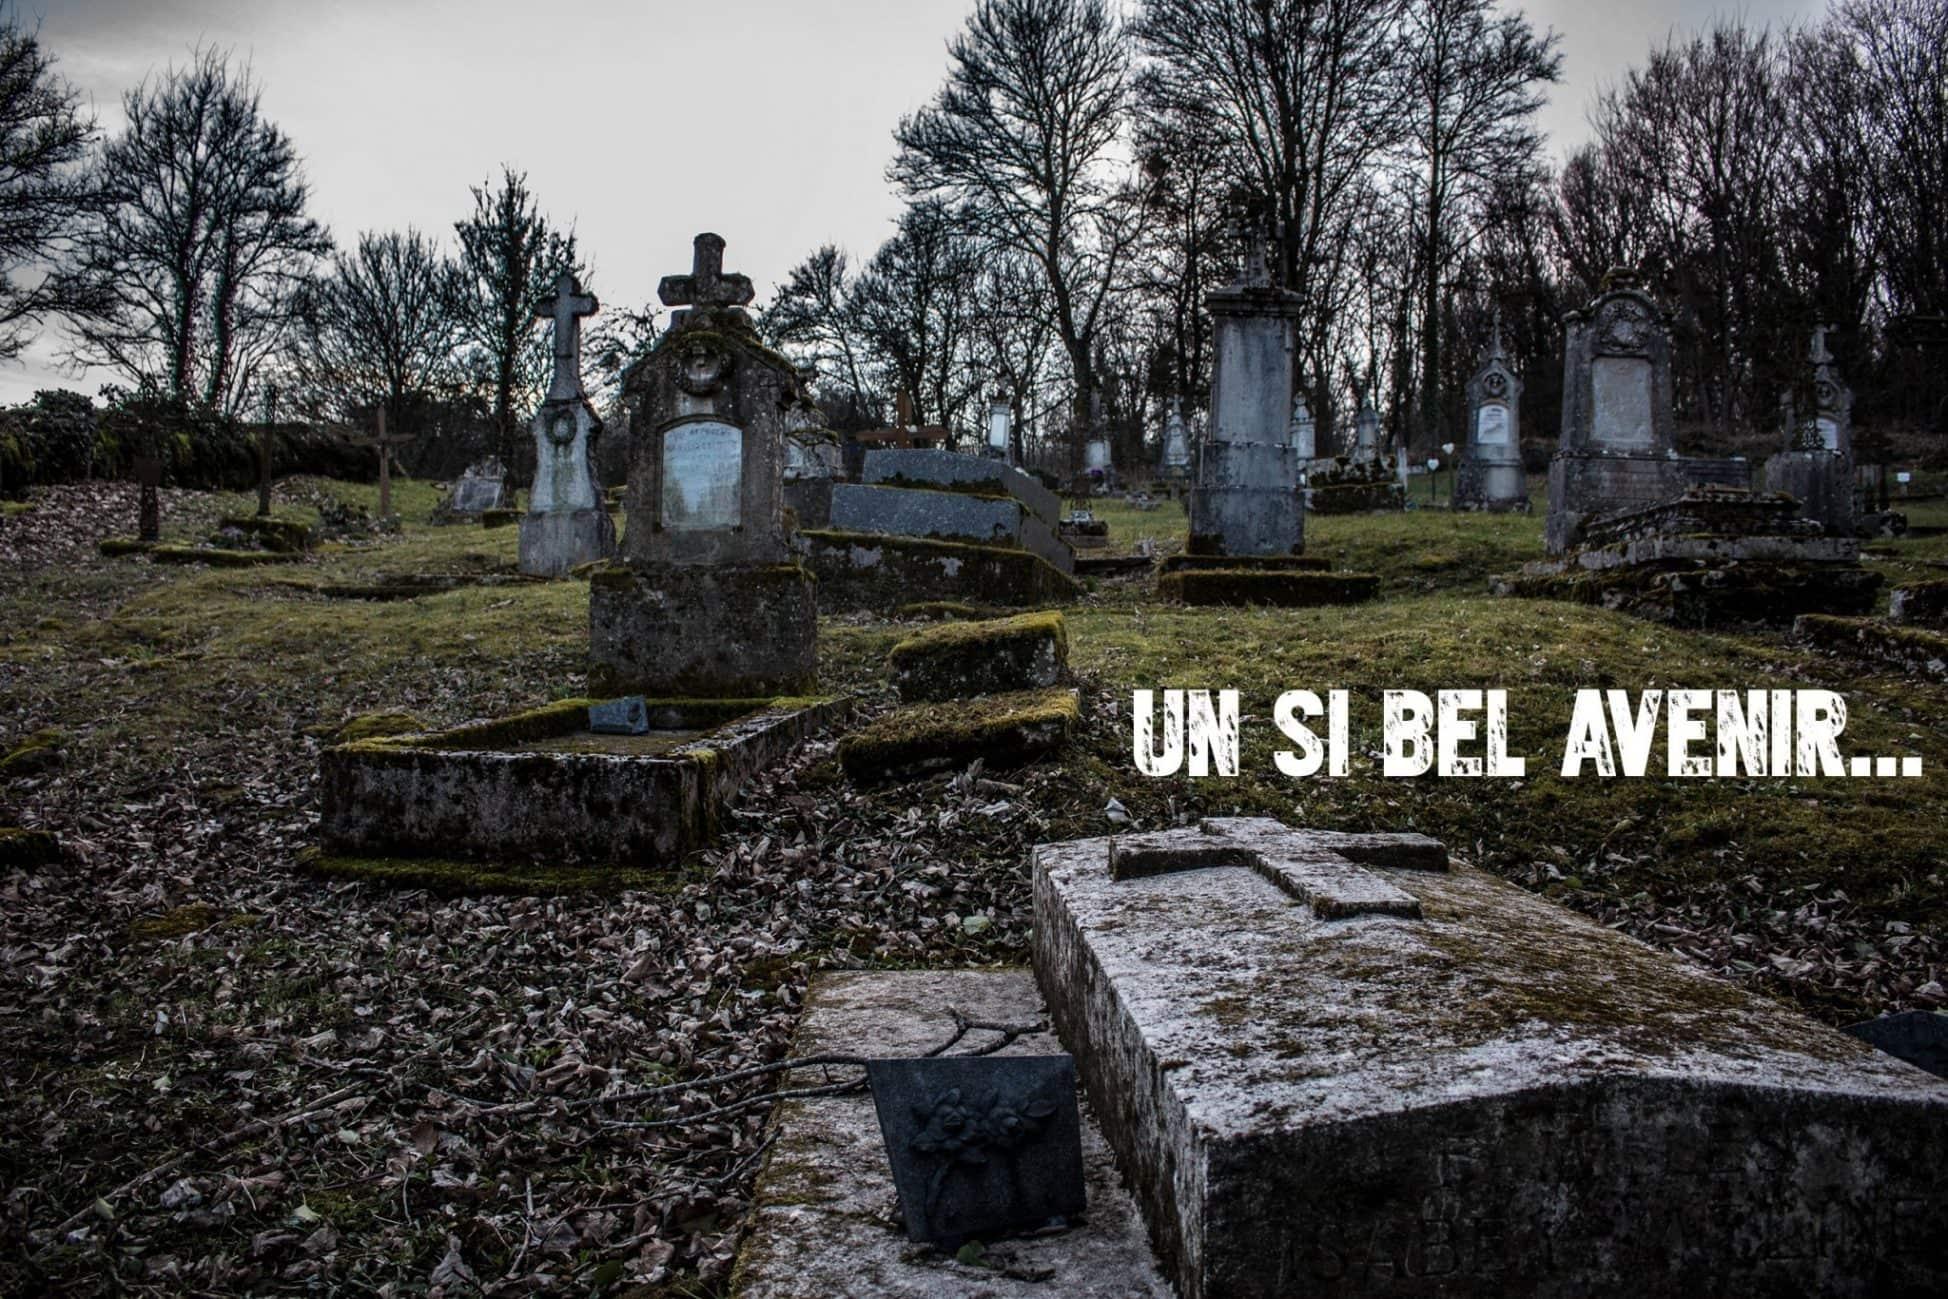 unsibelavenir-1